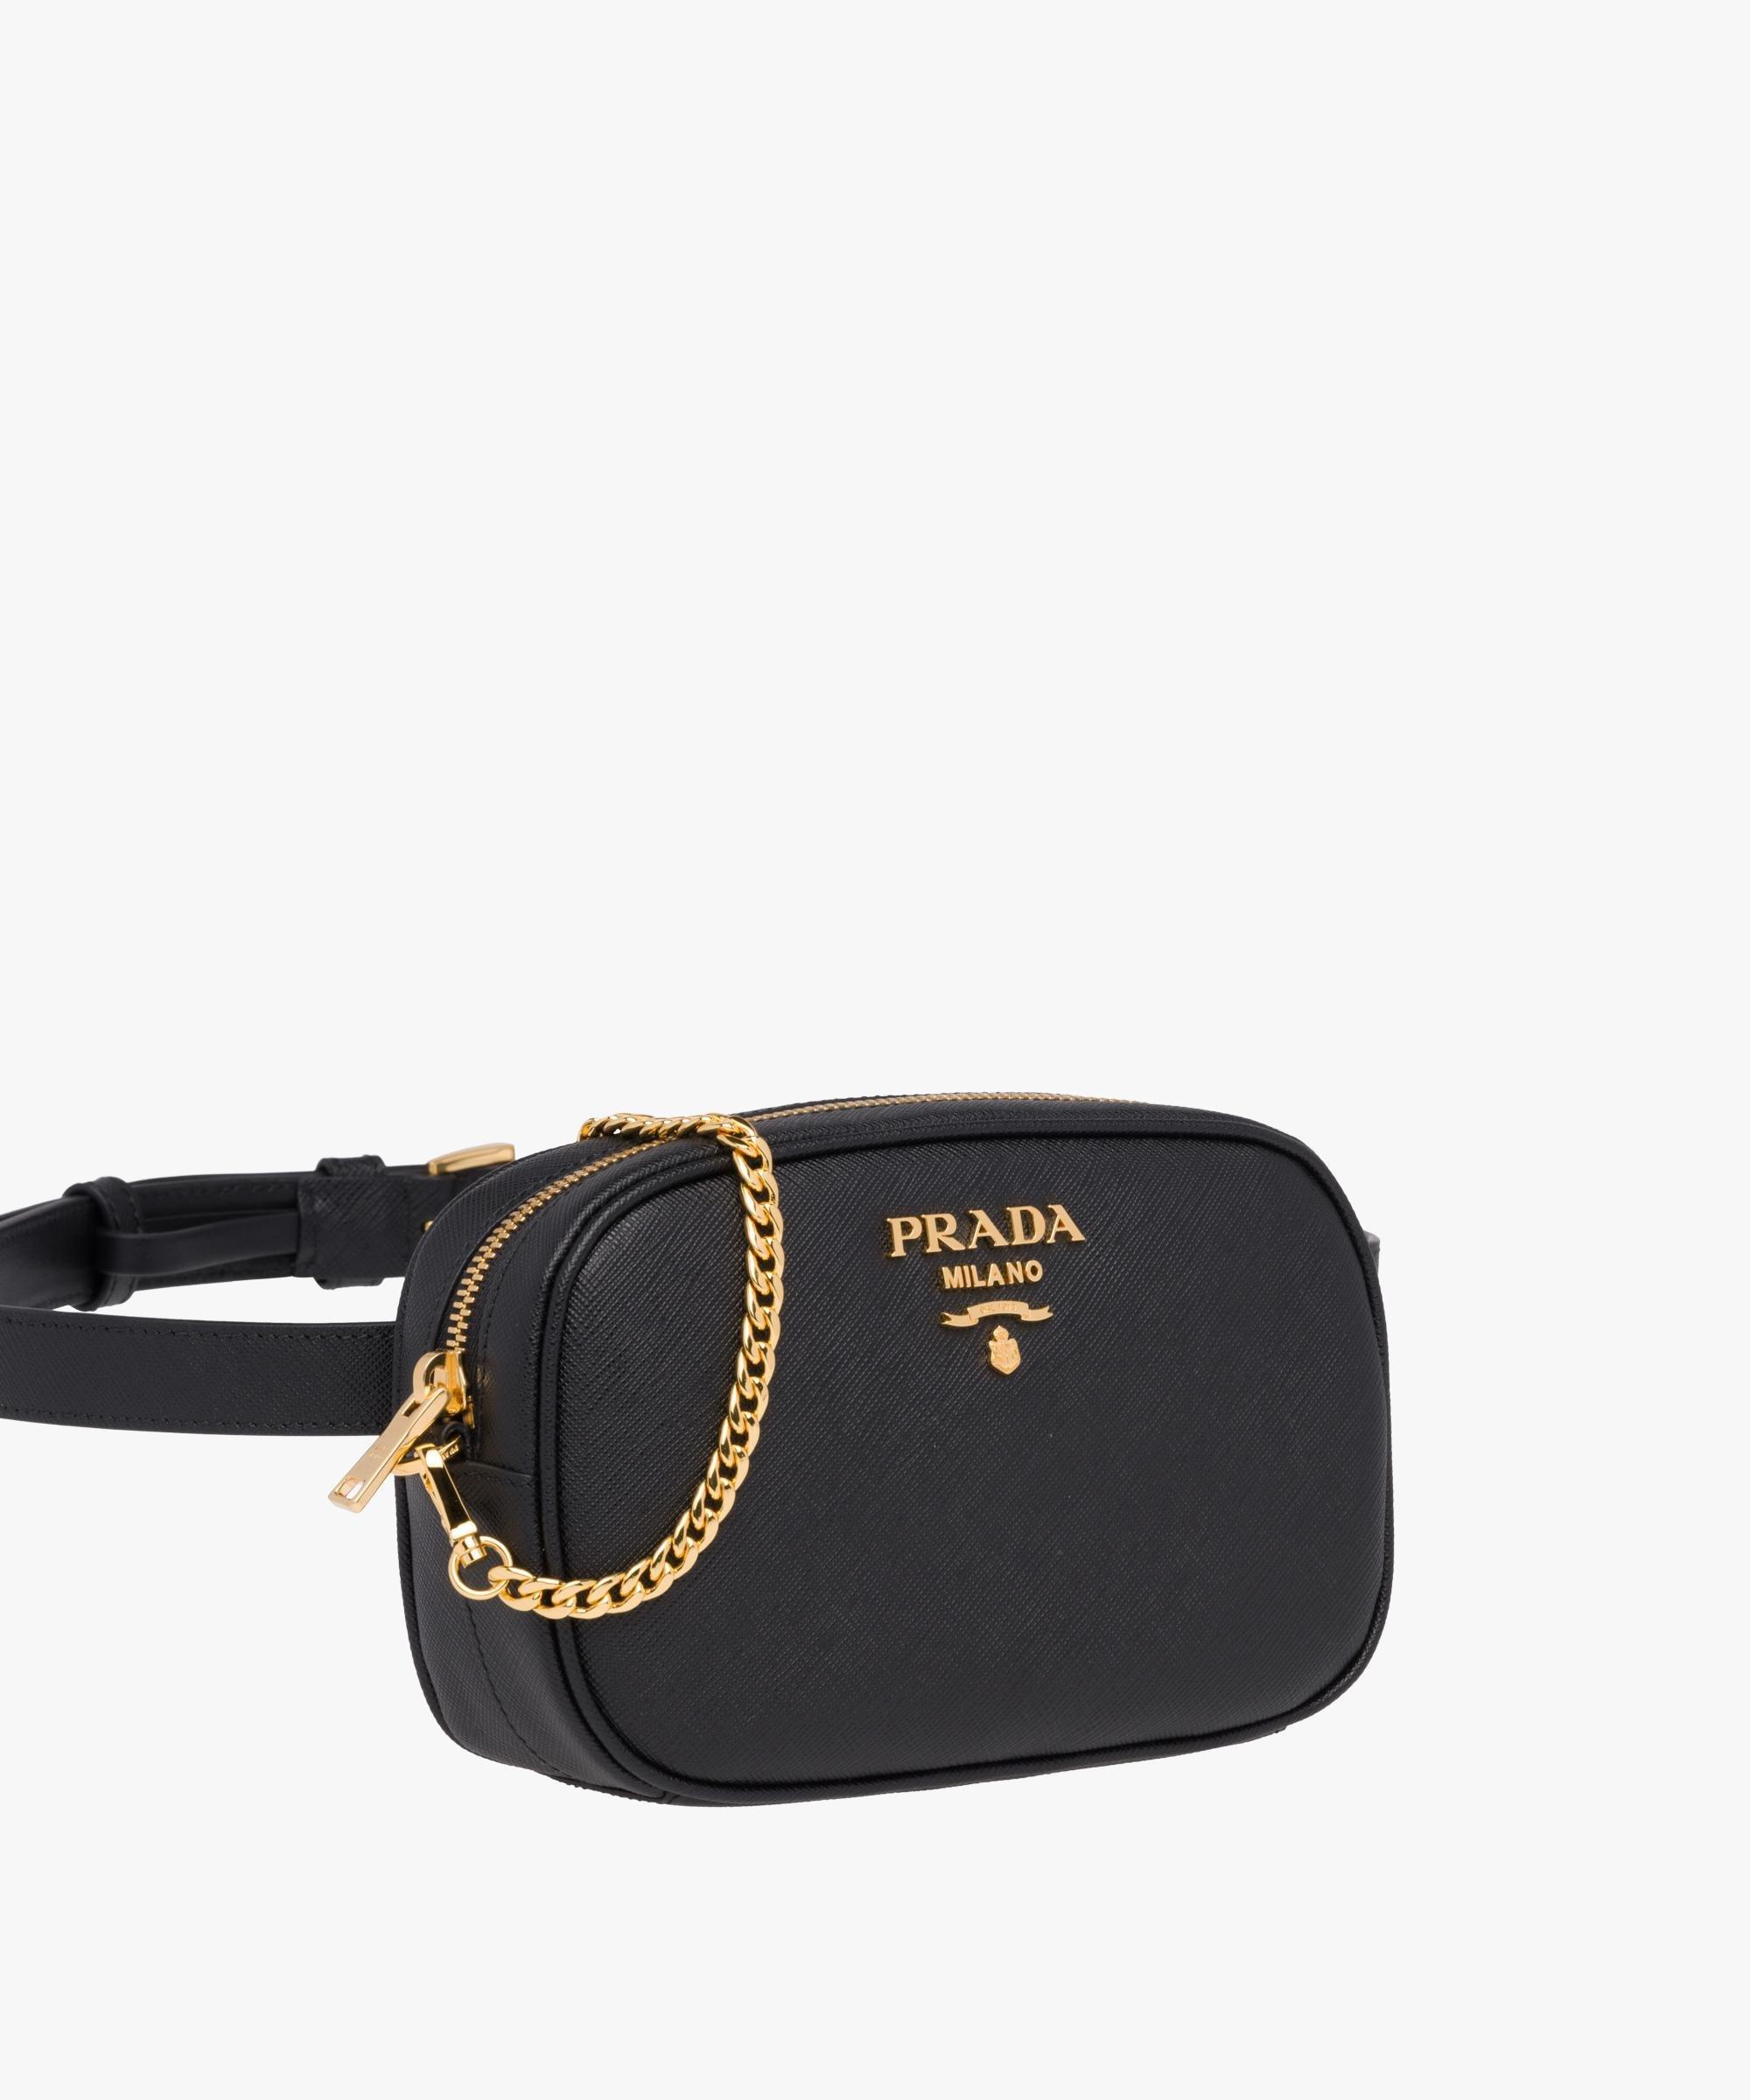 ee232c664d0cd Prada Saffiano Leather Belt Bag in Black - Lyst